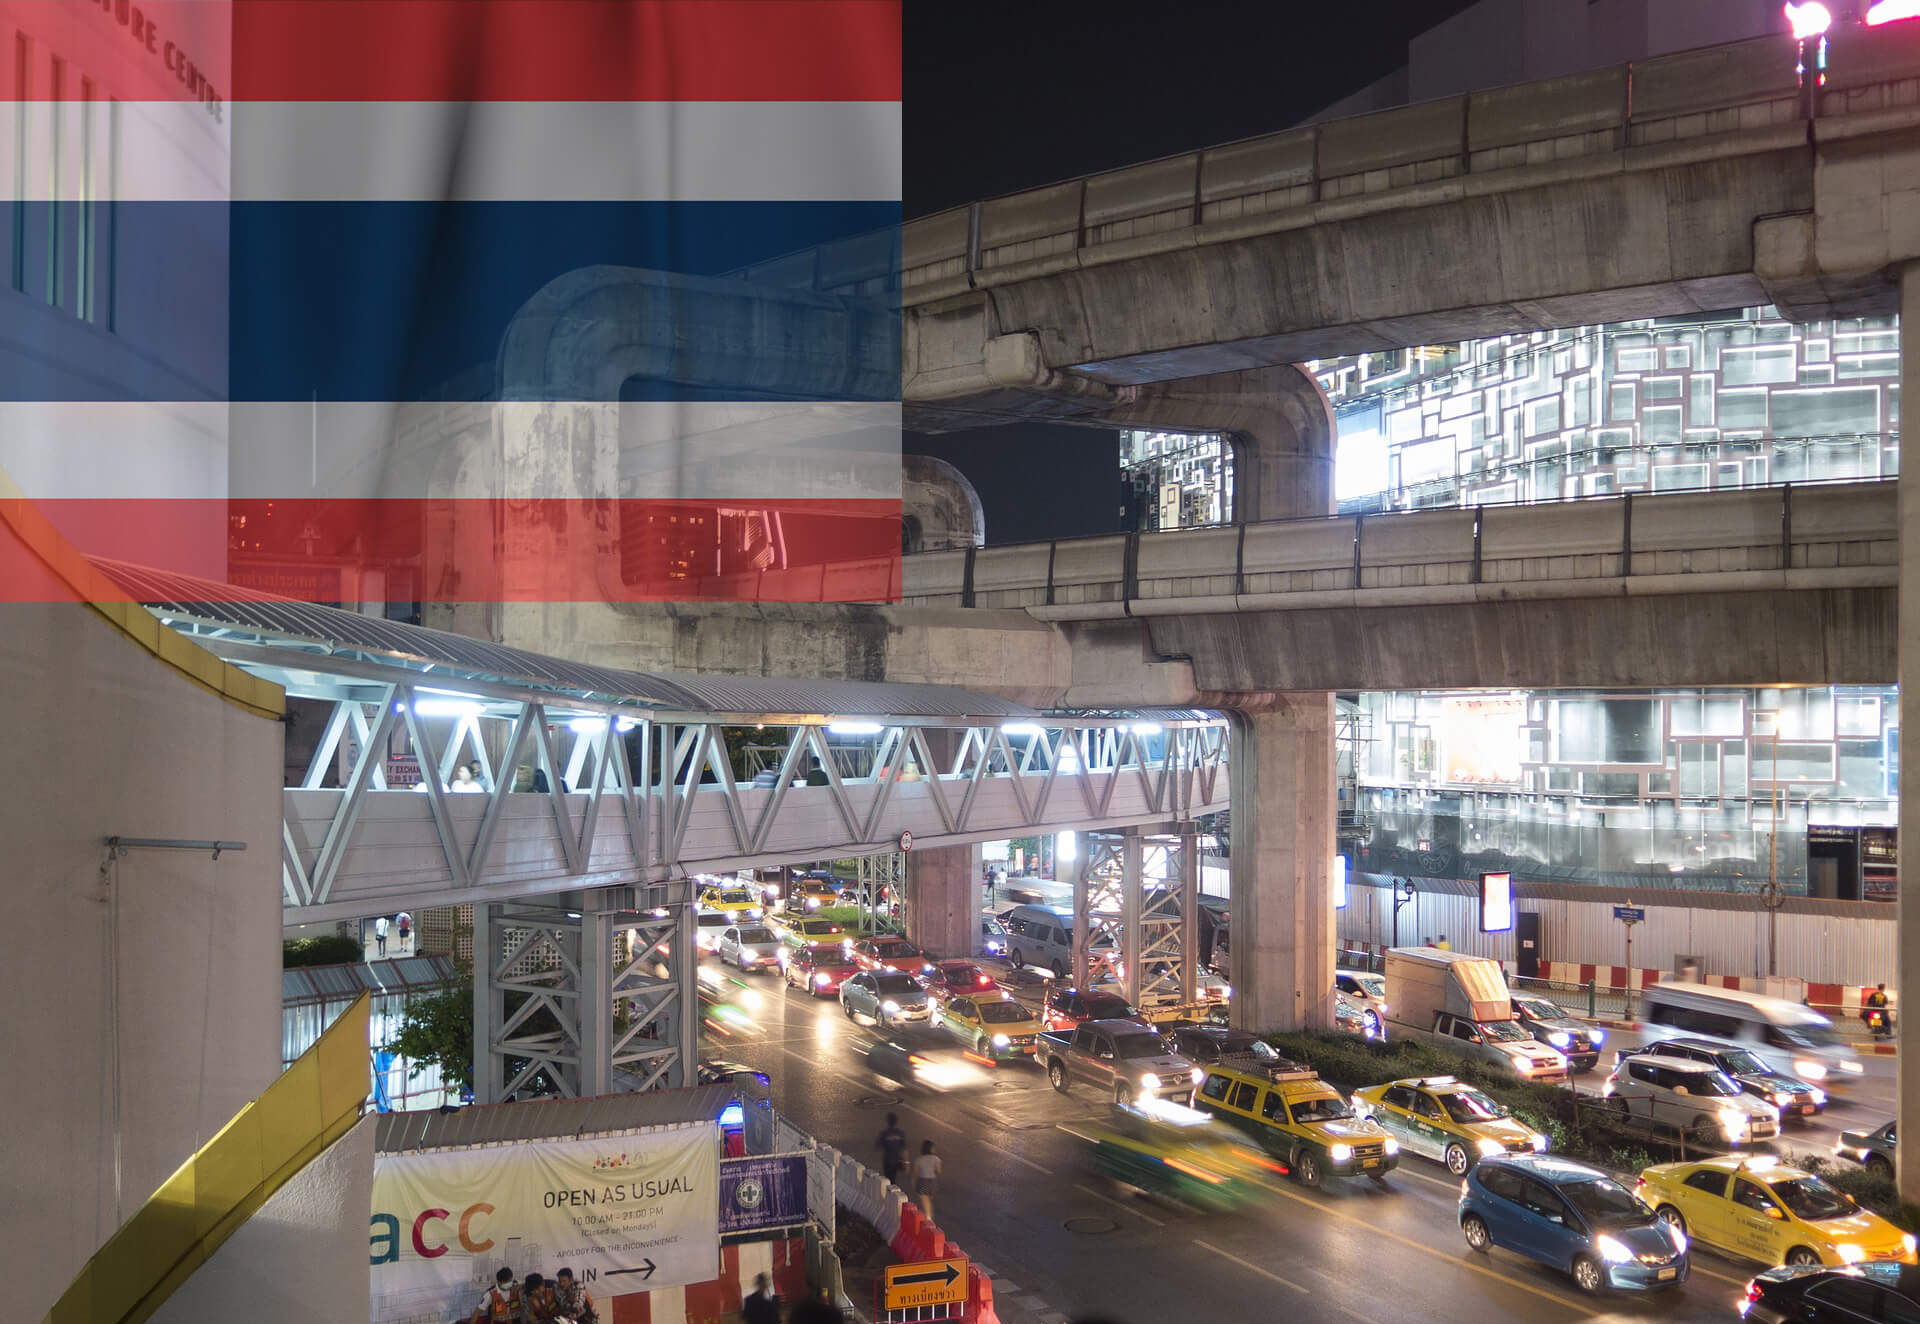 thailand_bangkok_city (1)